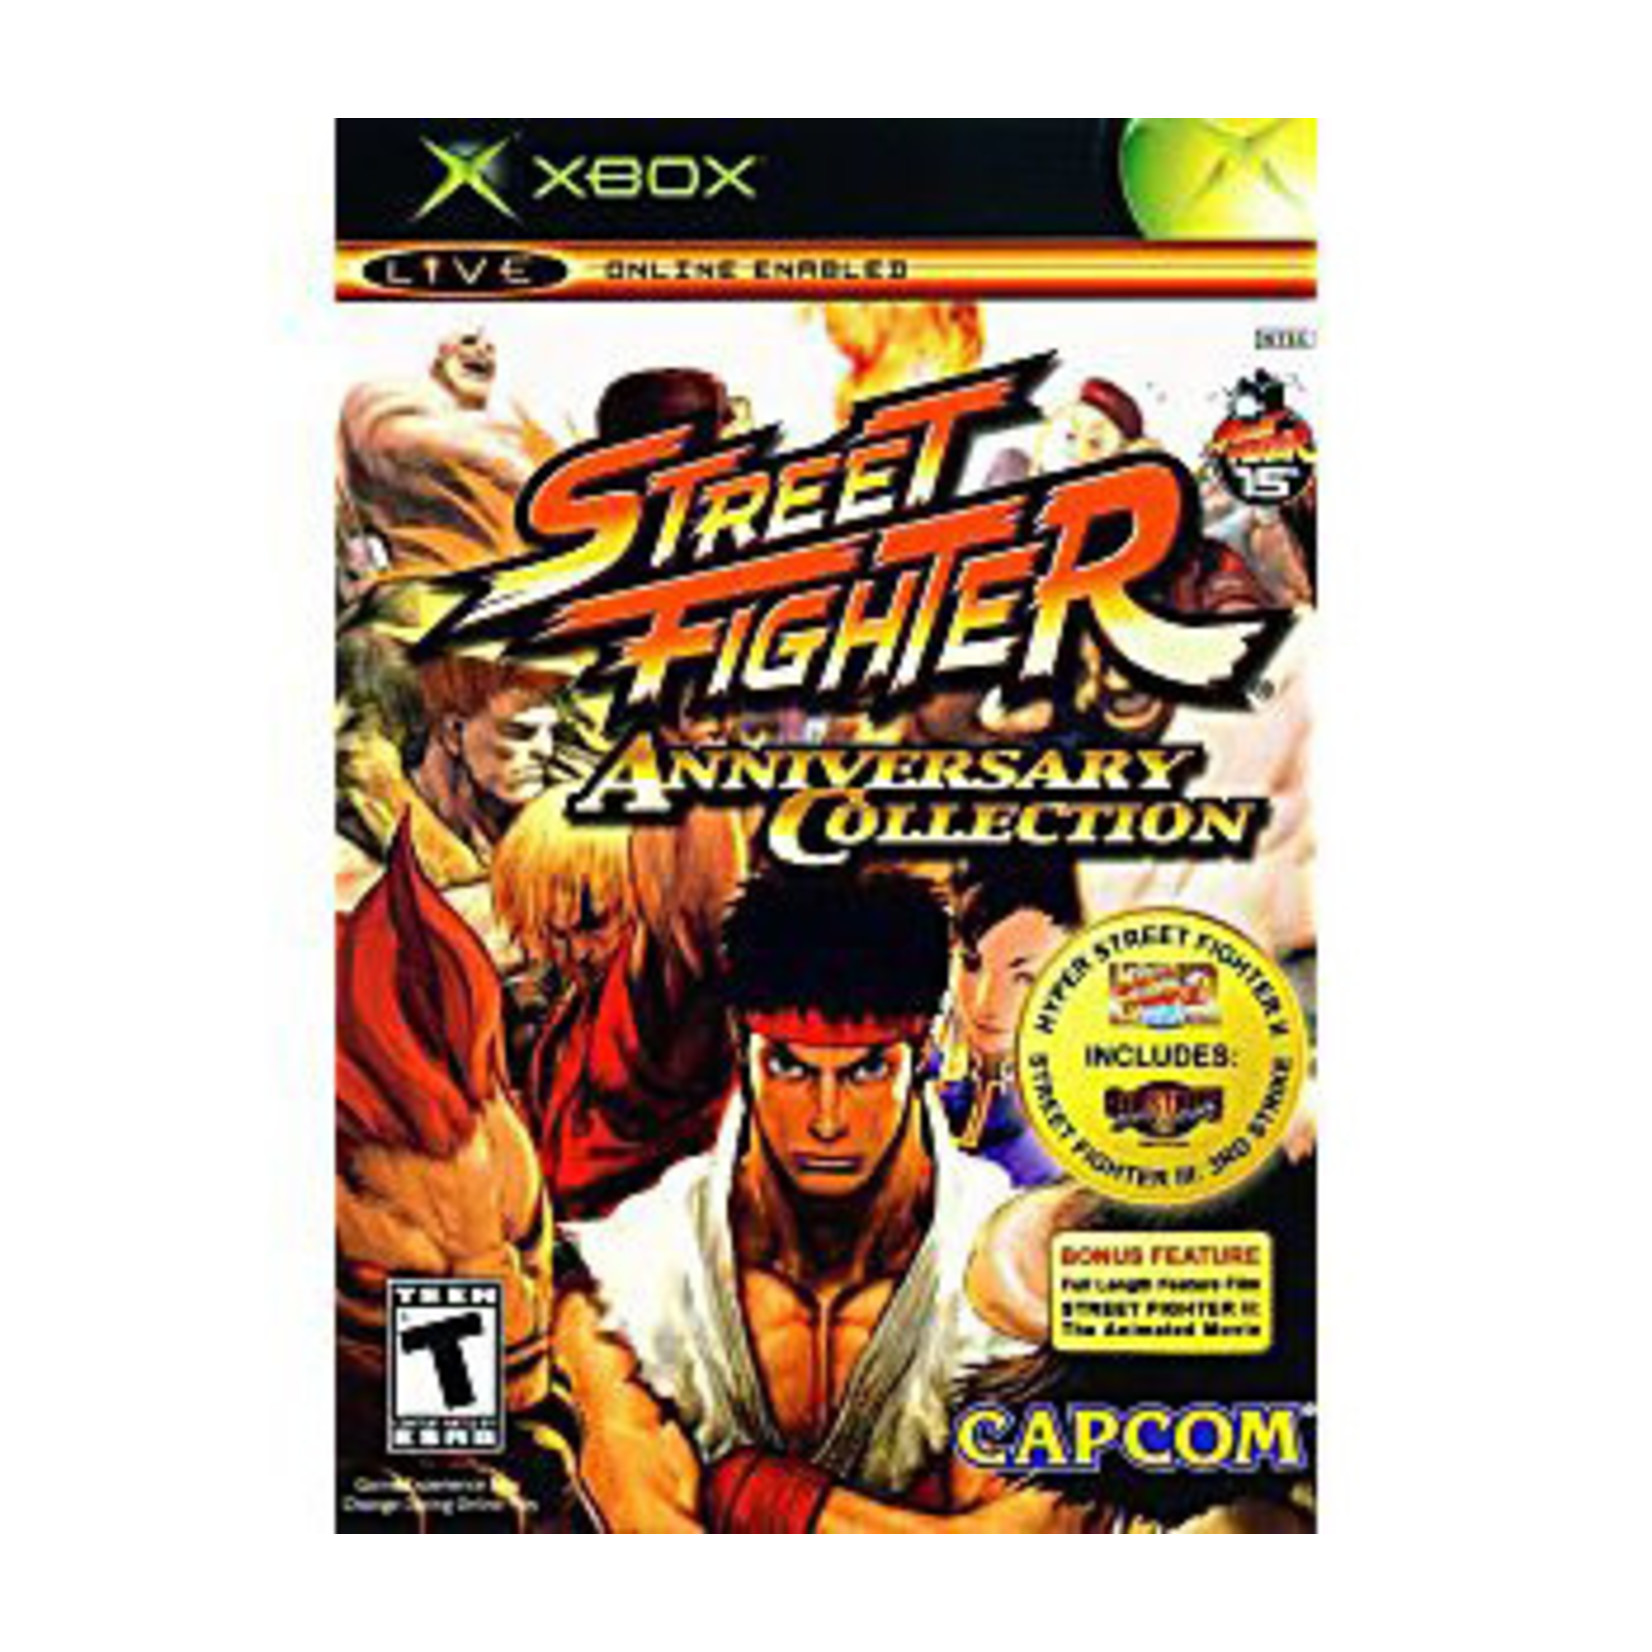 XBU-Street Fighter Anniversary